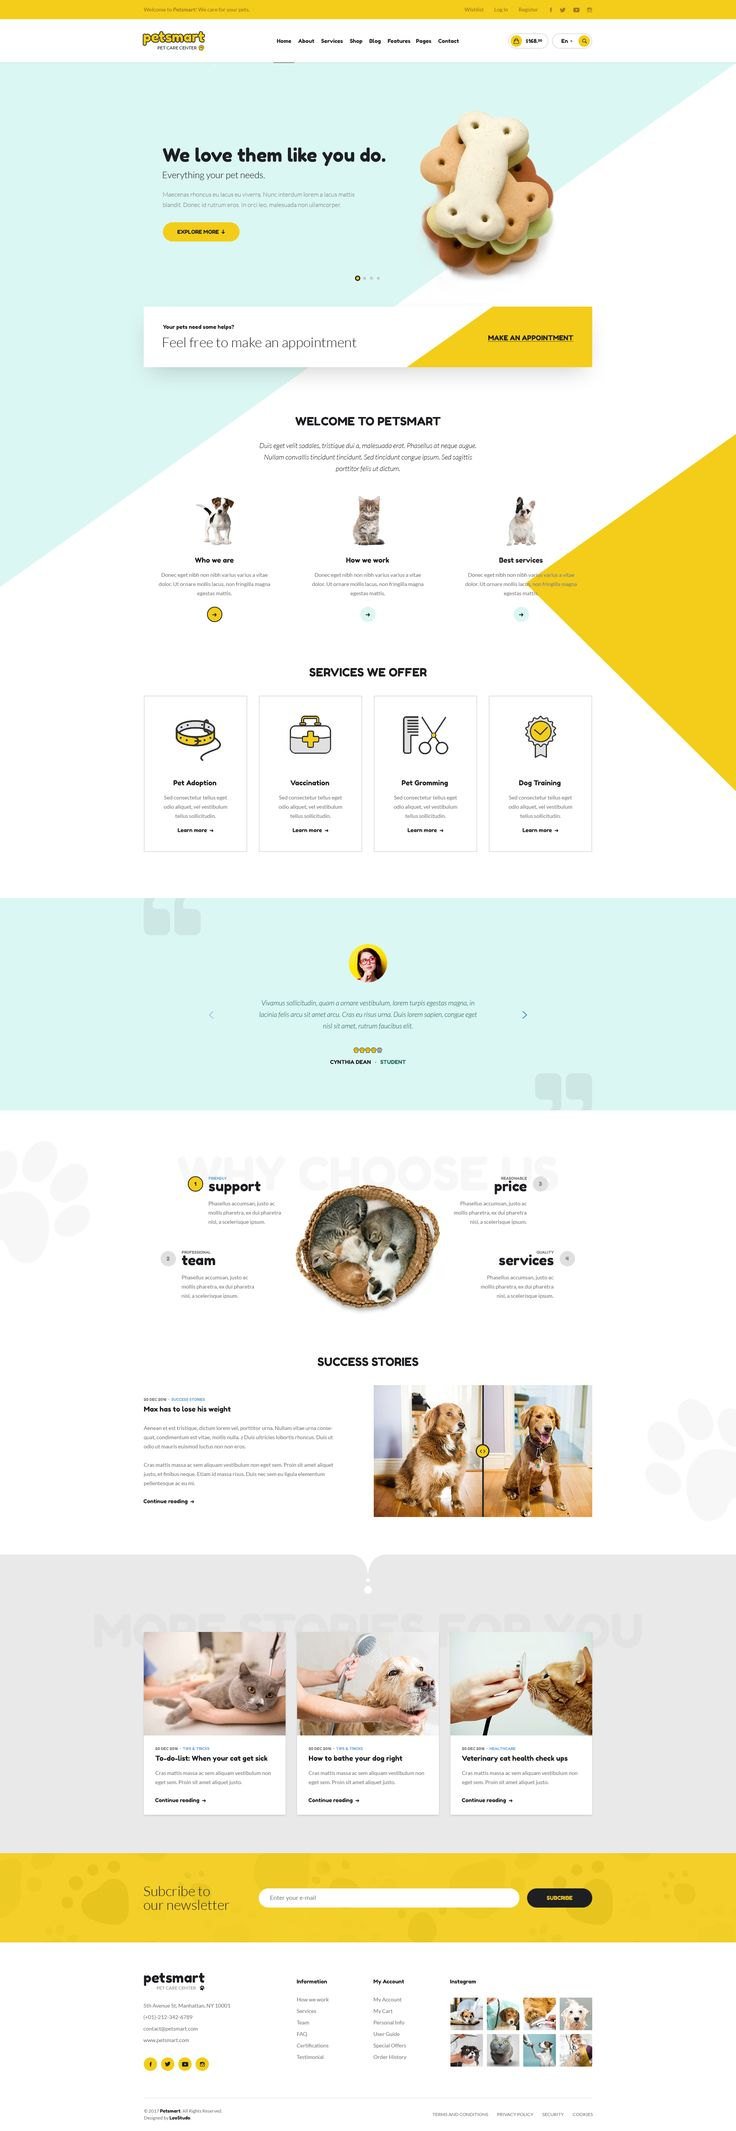 Pet Care, Shop & Hotel | Petsmart #petsmart #psd #psd template • Download ➝ https://themeforest.net/item/pet-care-shop-hotel-petsmart/19448420?ref=pxcr